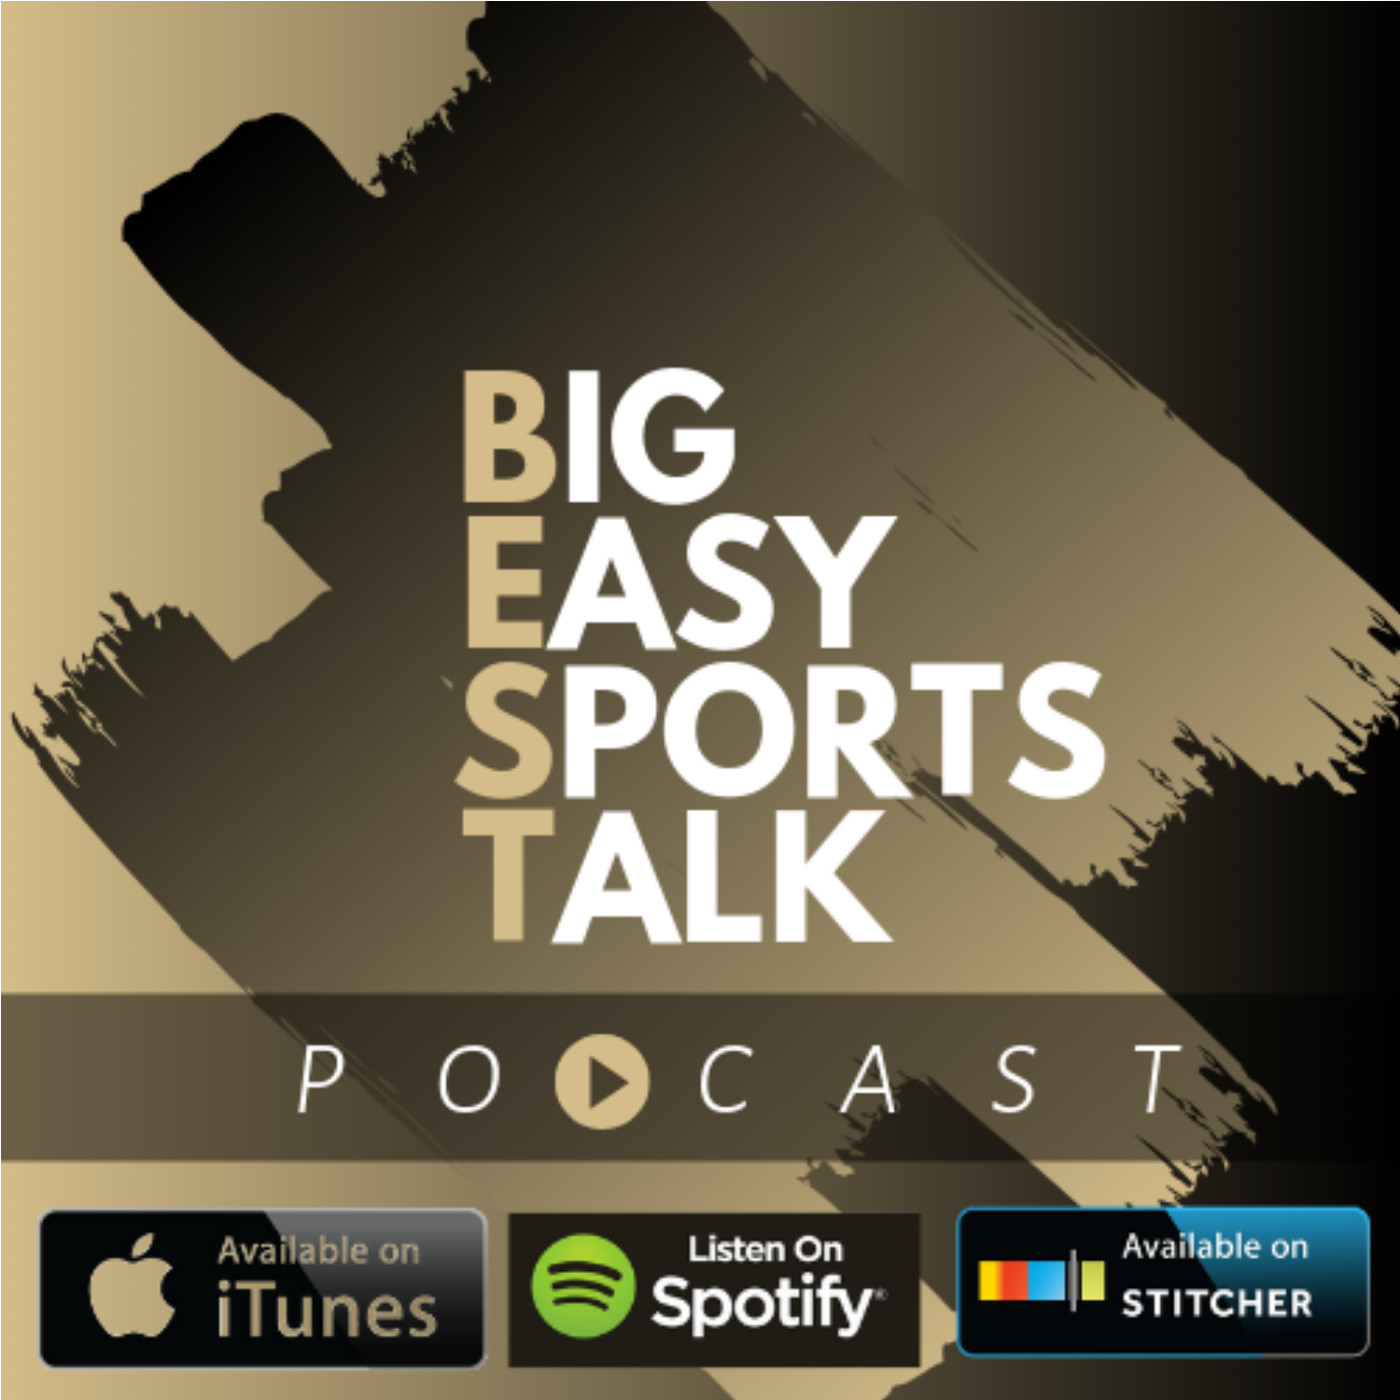 Big Easy Sports Talk Podcast